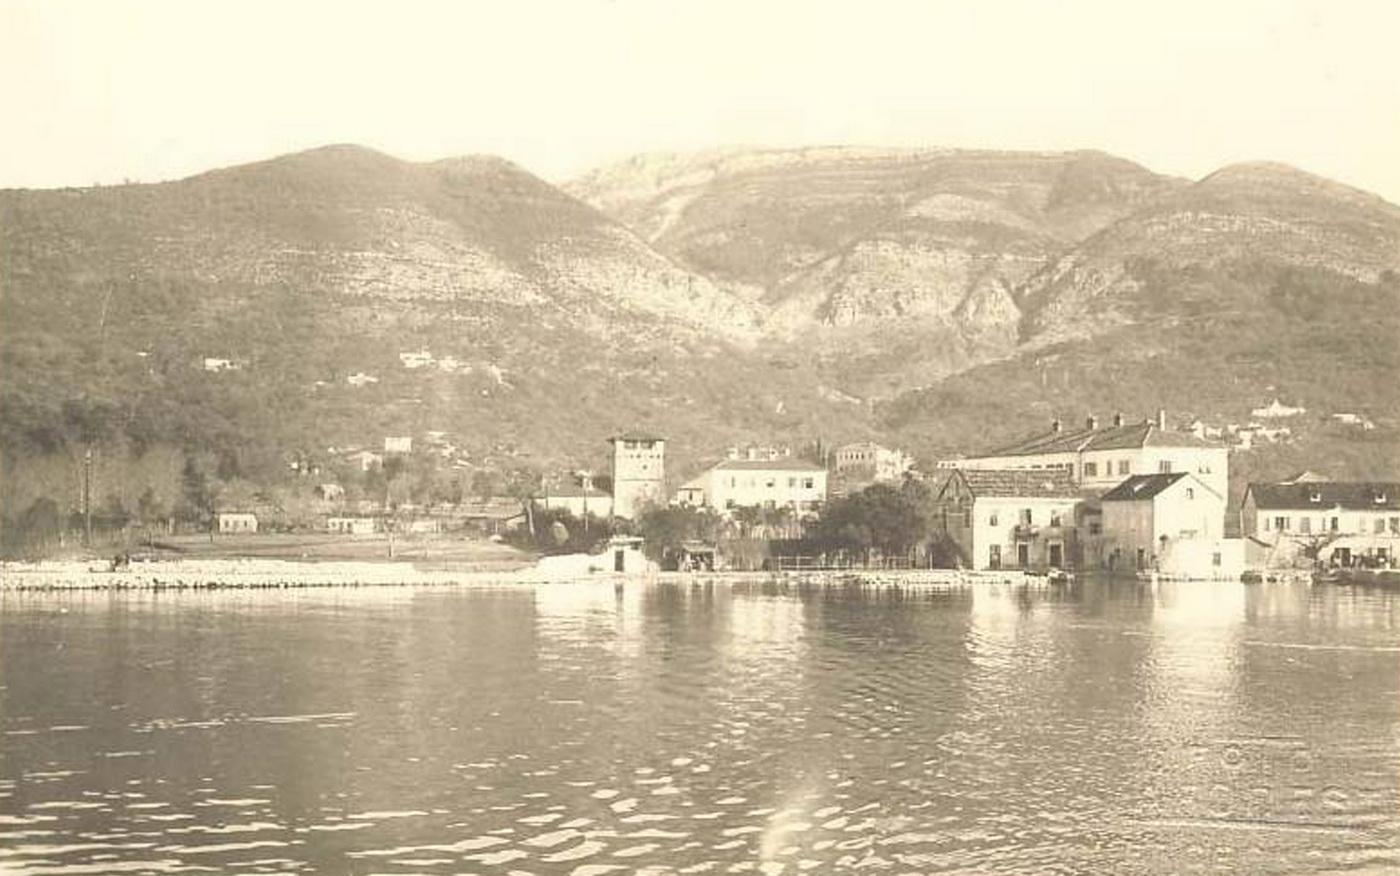 Buće - Luković